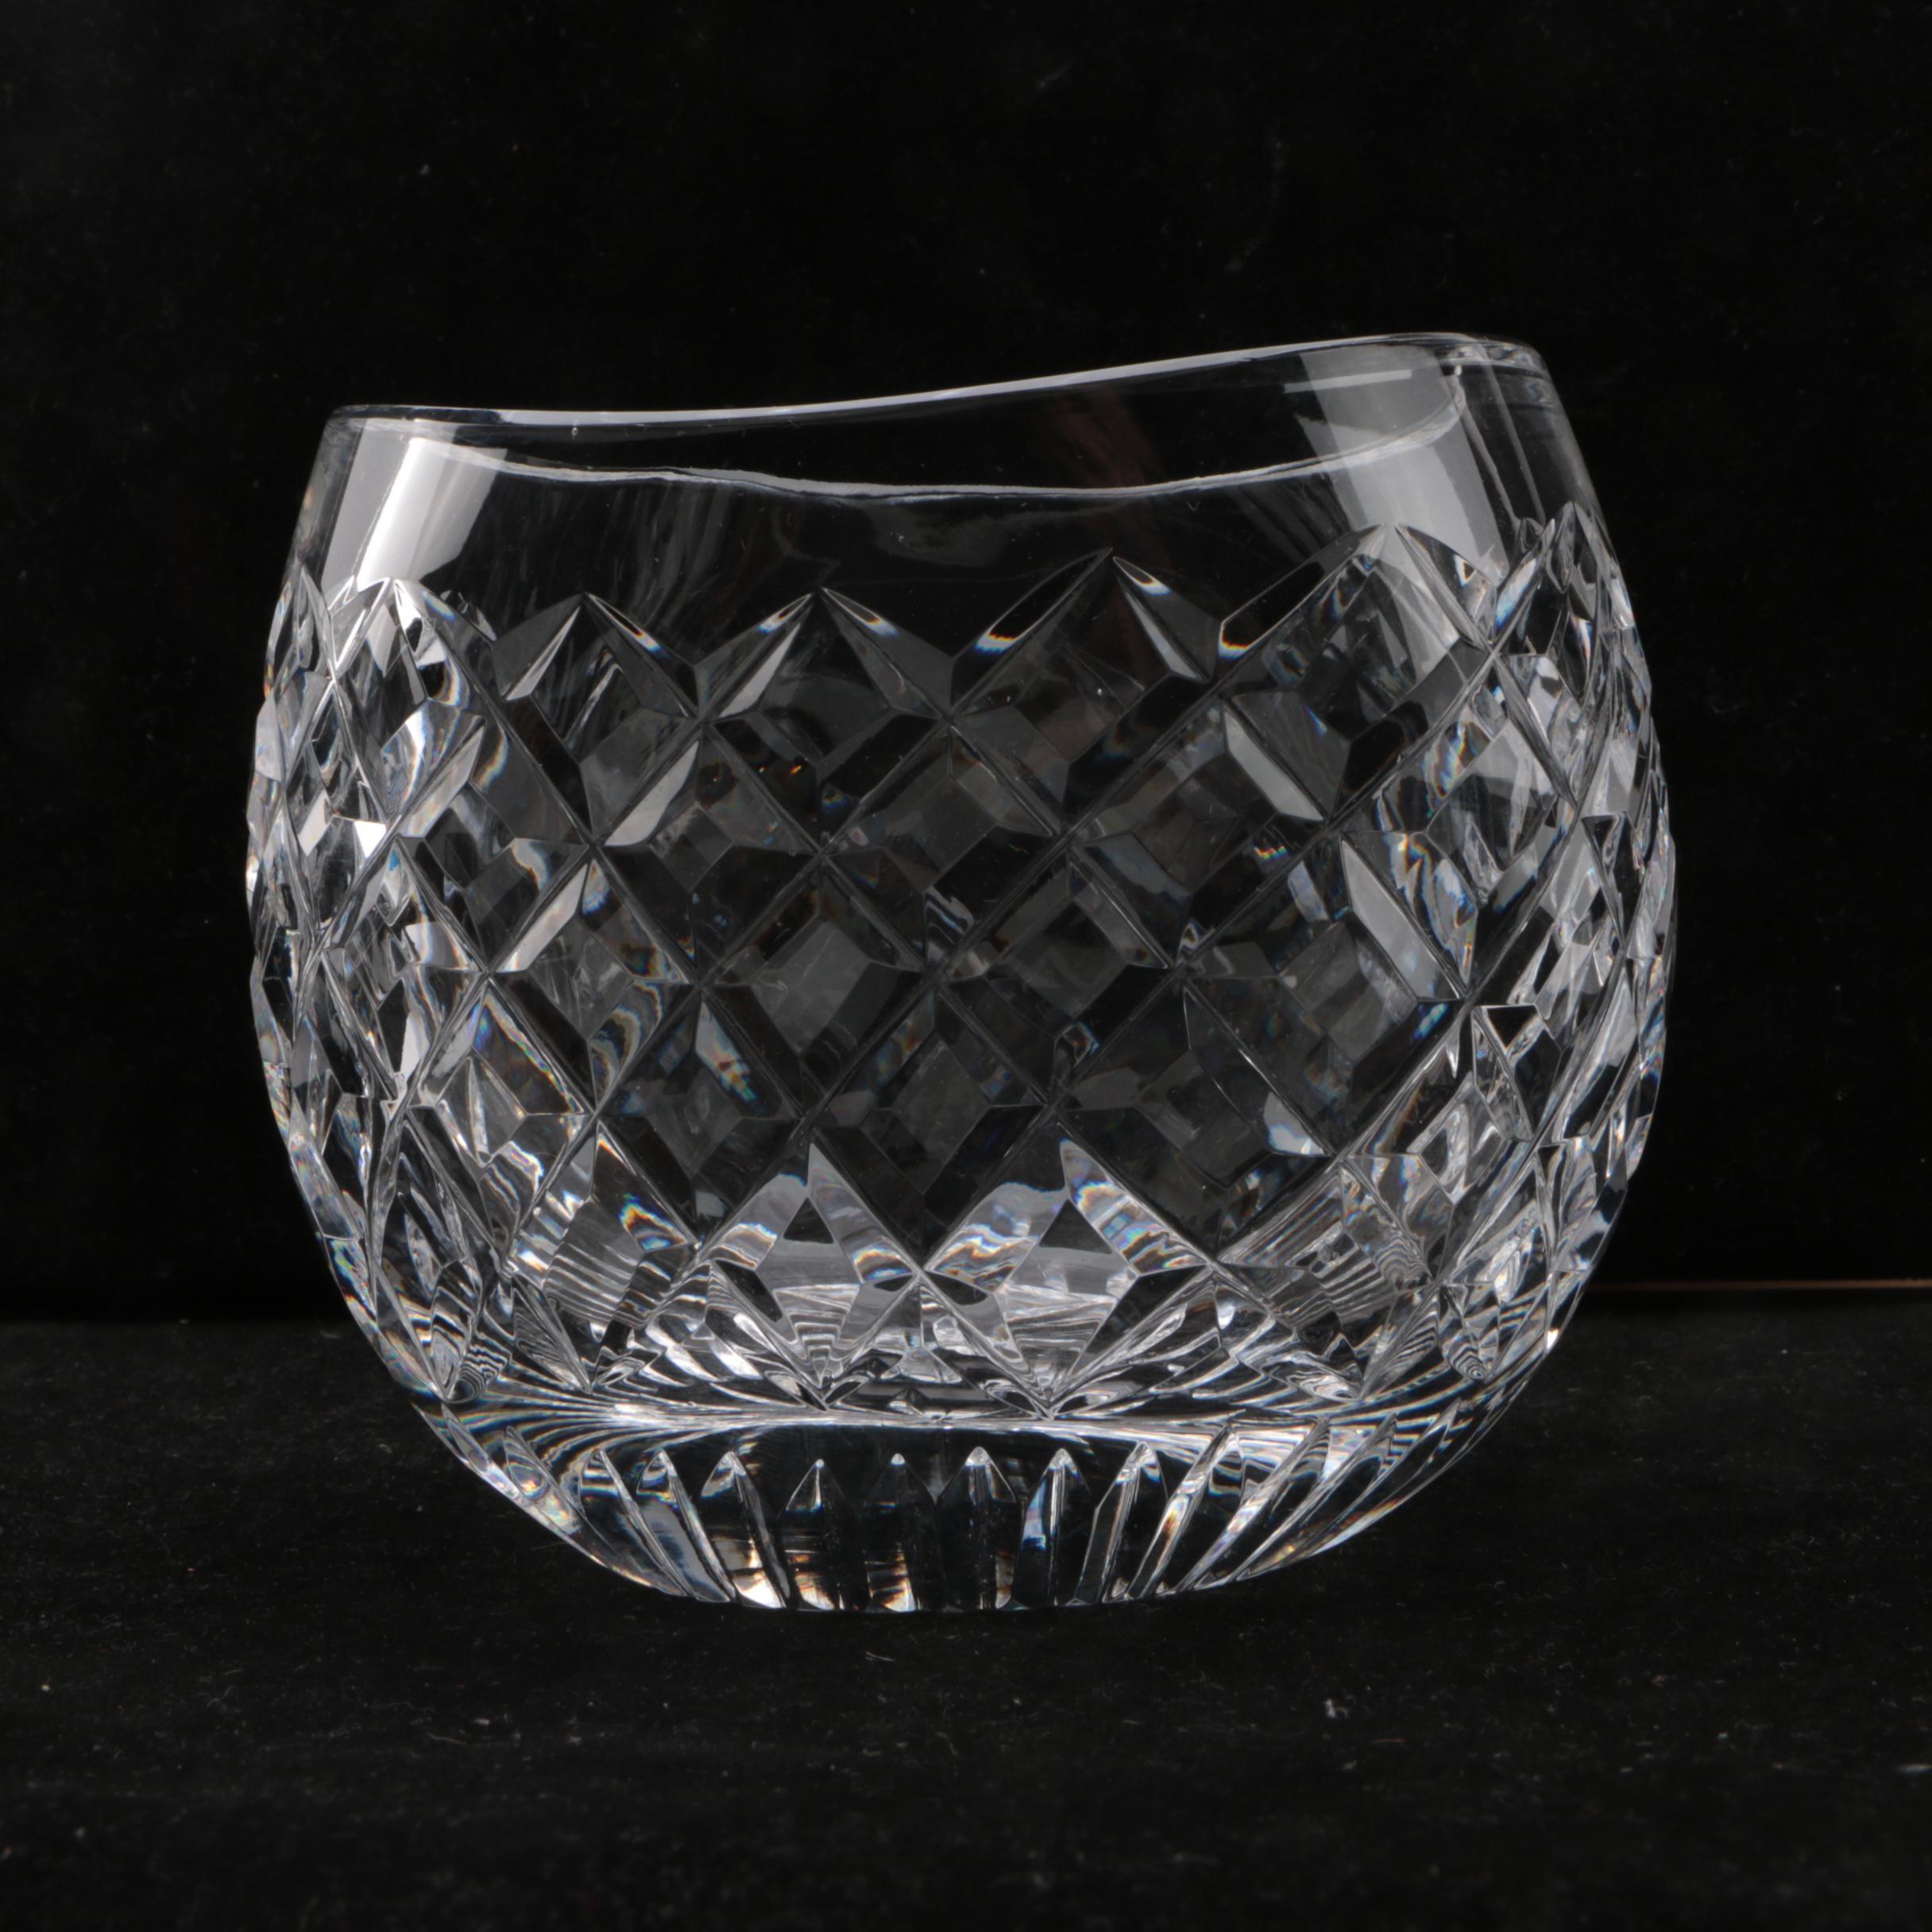 Waterford Crystal Oval Vase